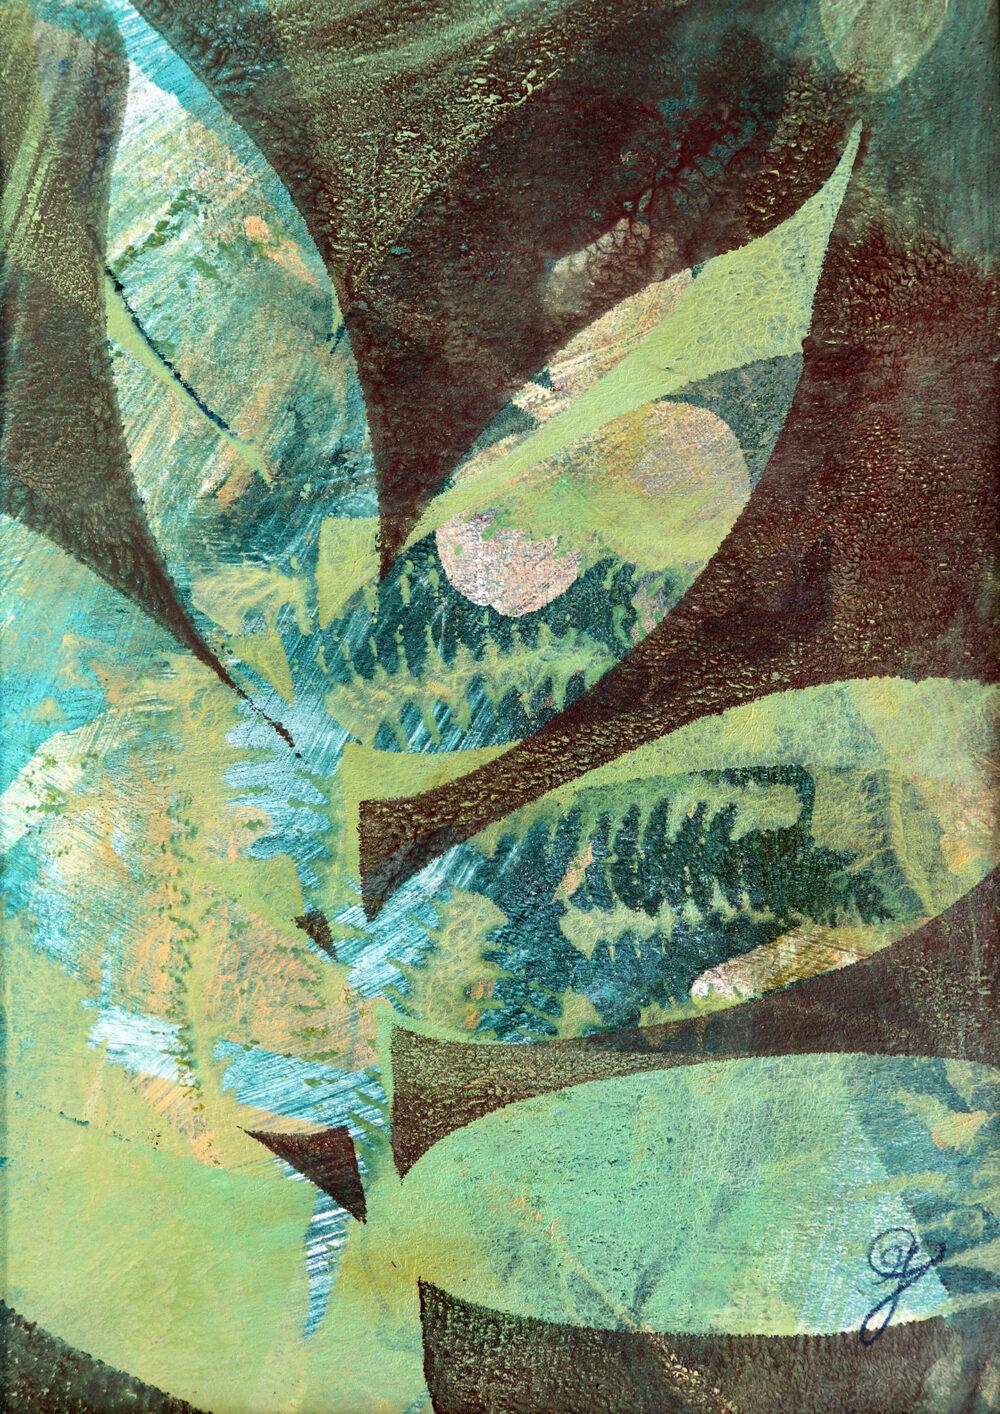 memoire-abstrait-botanique-artiste-peintre-carine-genadry